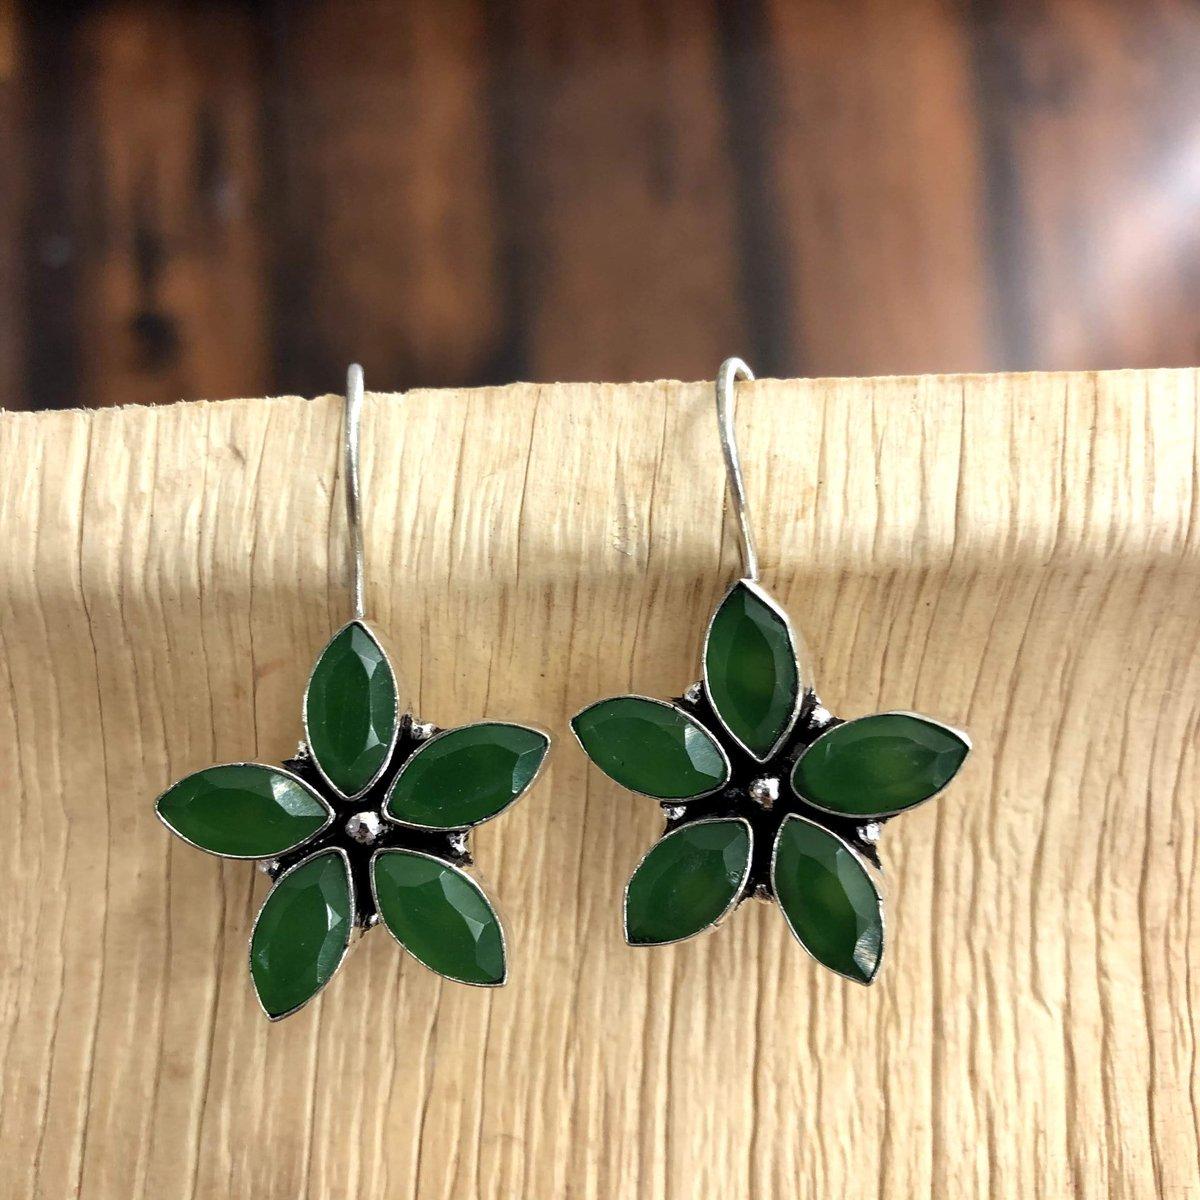 Oxidised Stone Drop Earrings  #fashion #accessories #jewellery #jewelry #oxidised #oxidisedjewellery #oxidisedearrings #stone #earrings #dropearrings #traditional #ethnic #indowestern #ethnicwear #womenswear #fashionjewelry #womensfashion #womensaccessories #womensjewellerypic.twitter.com/rBY8d5l3Kj